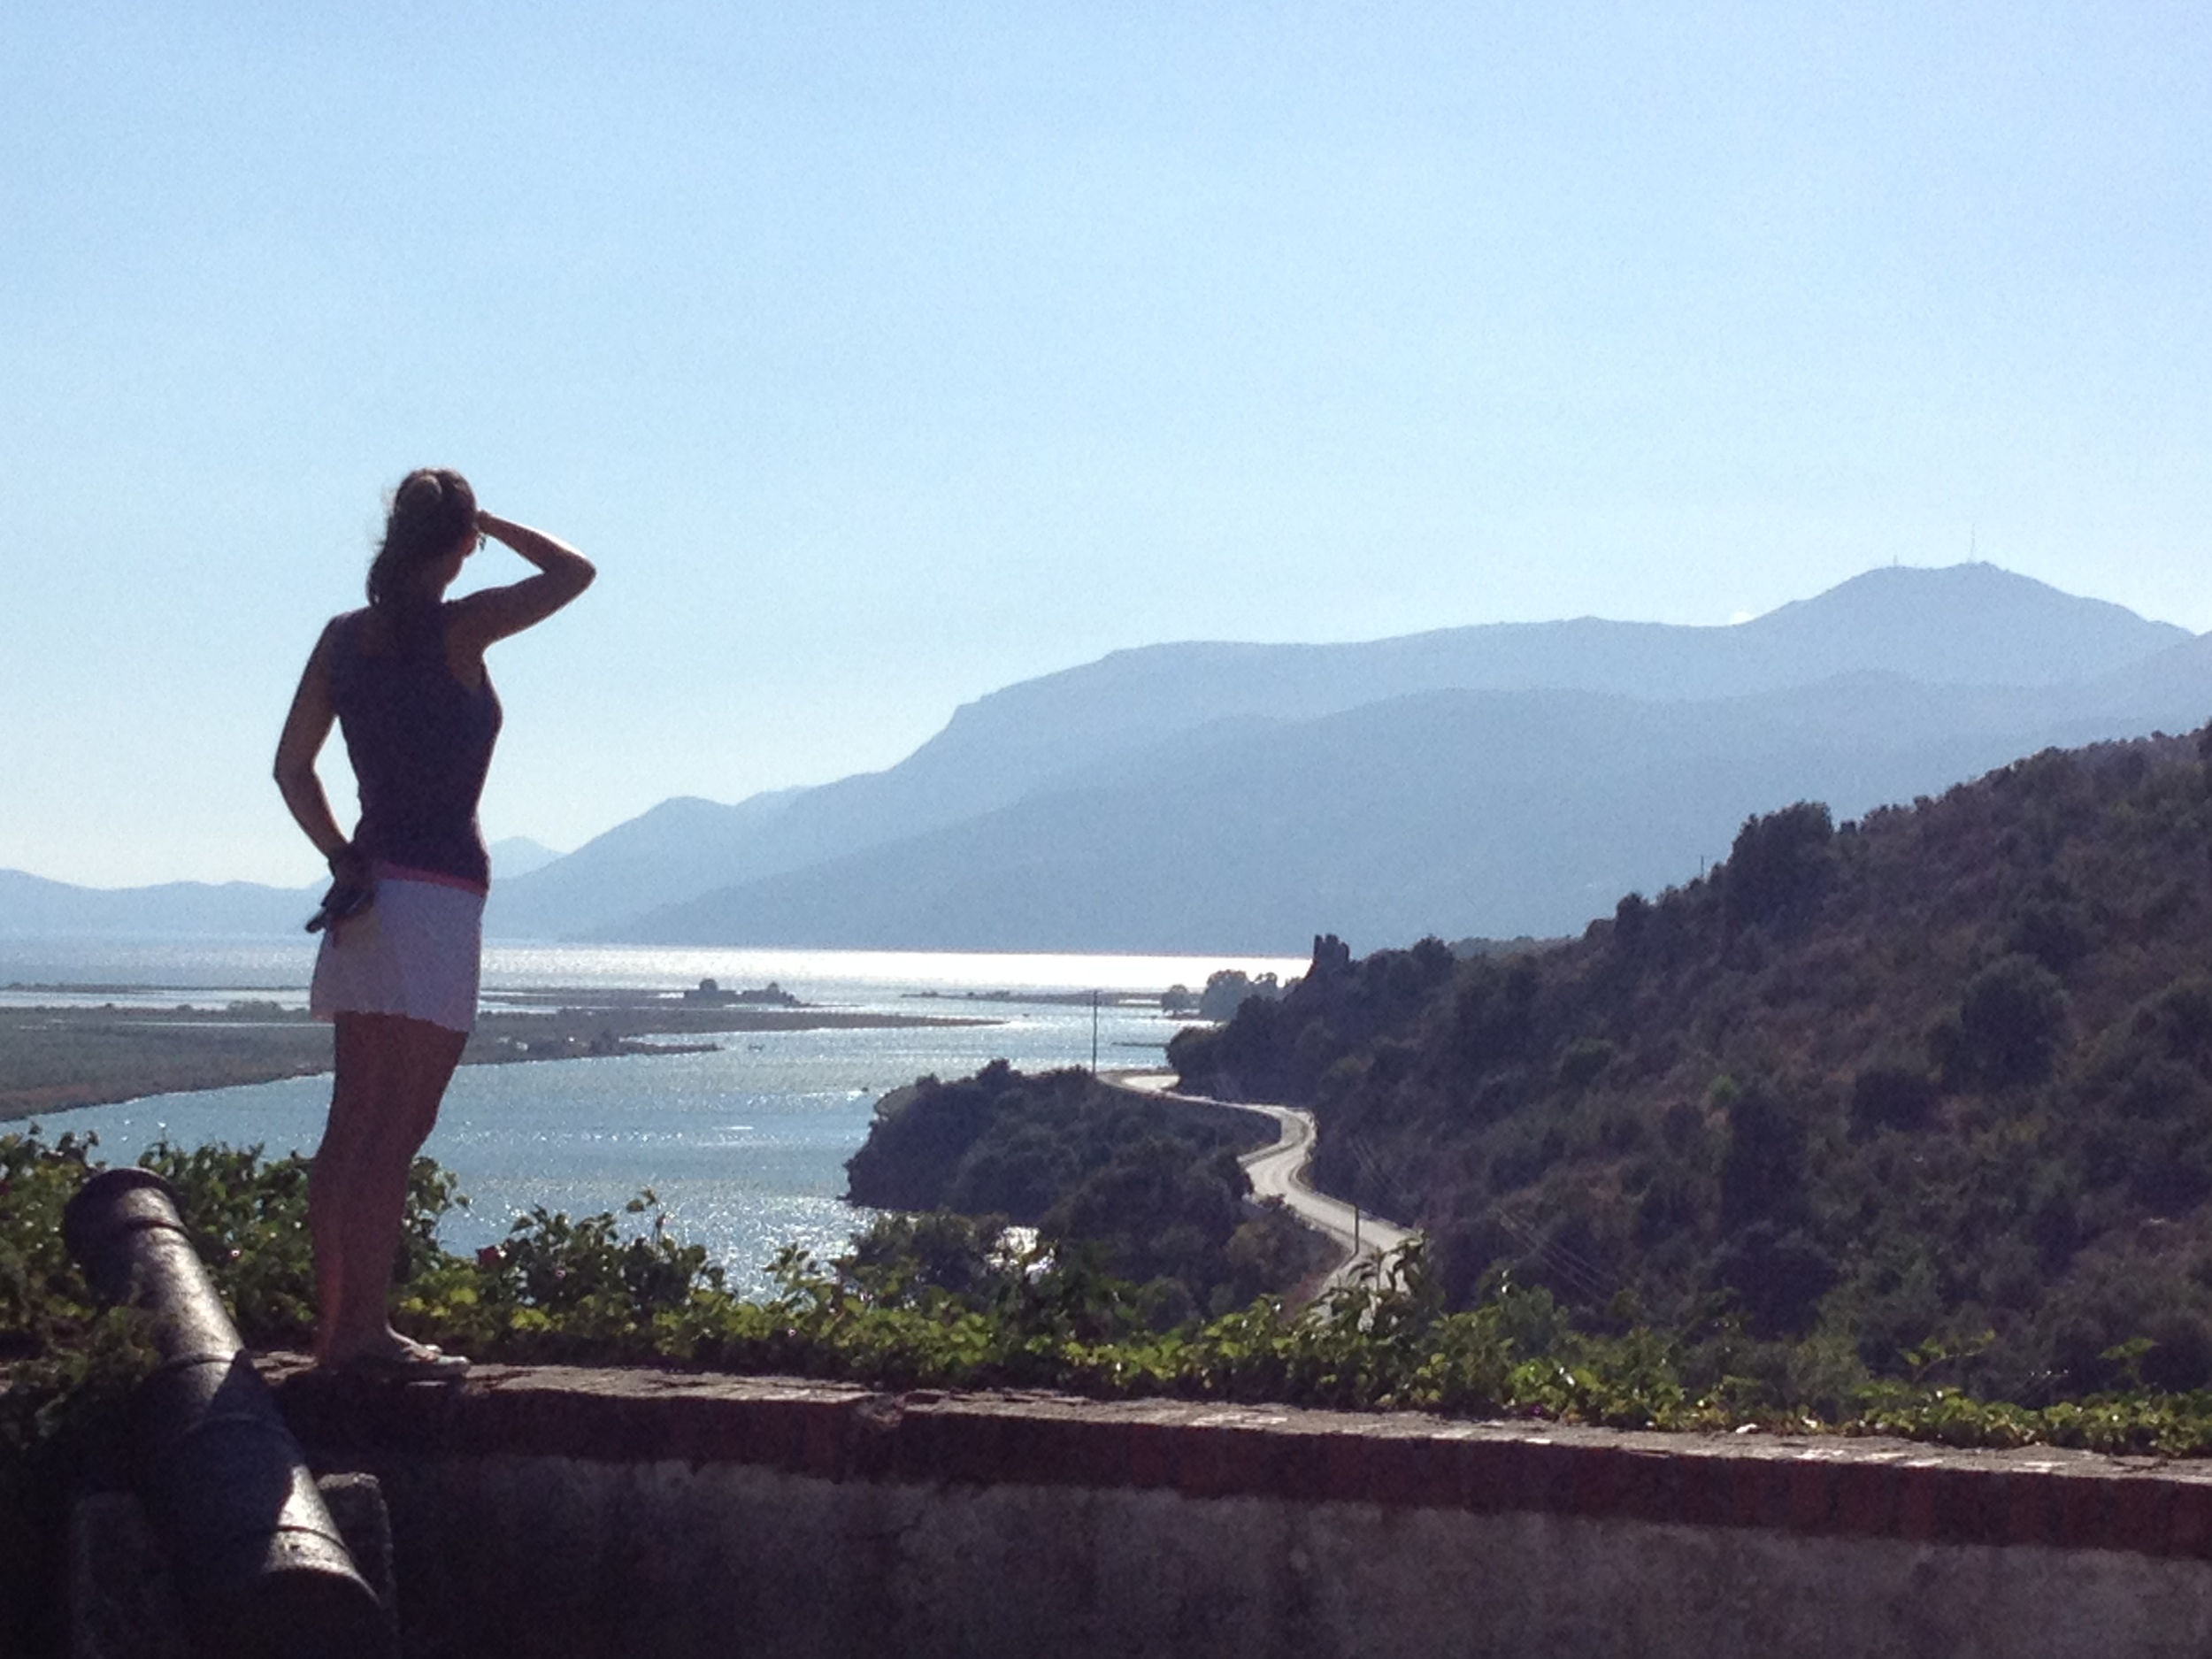 Scanning the horizon, seeking the Ionian Sea like thousands before us, Butrint, Albania